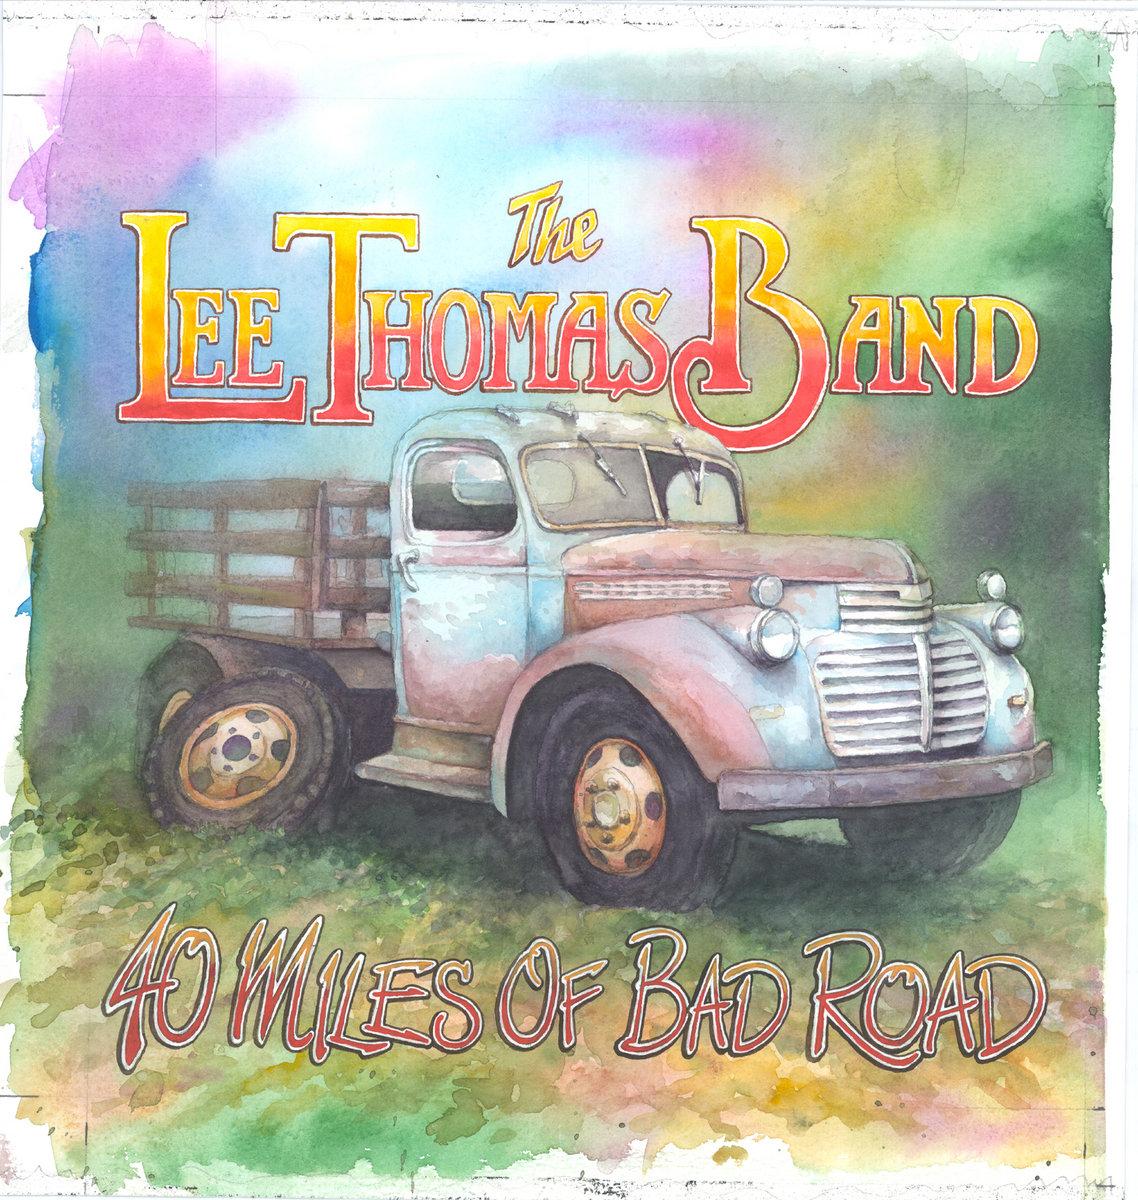 lee thomas band